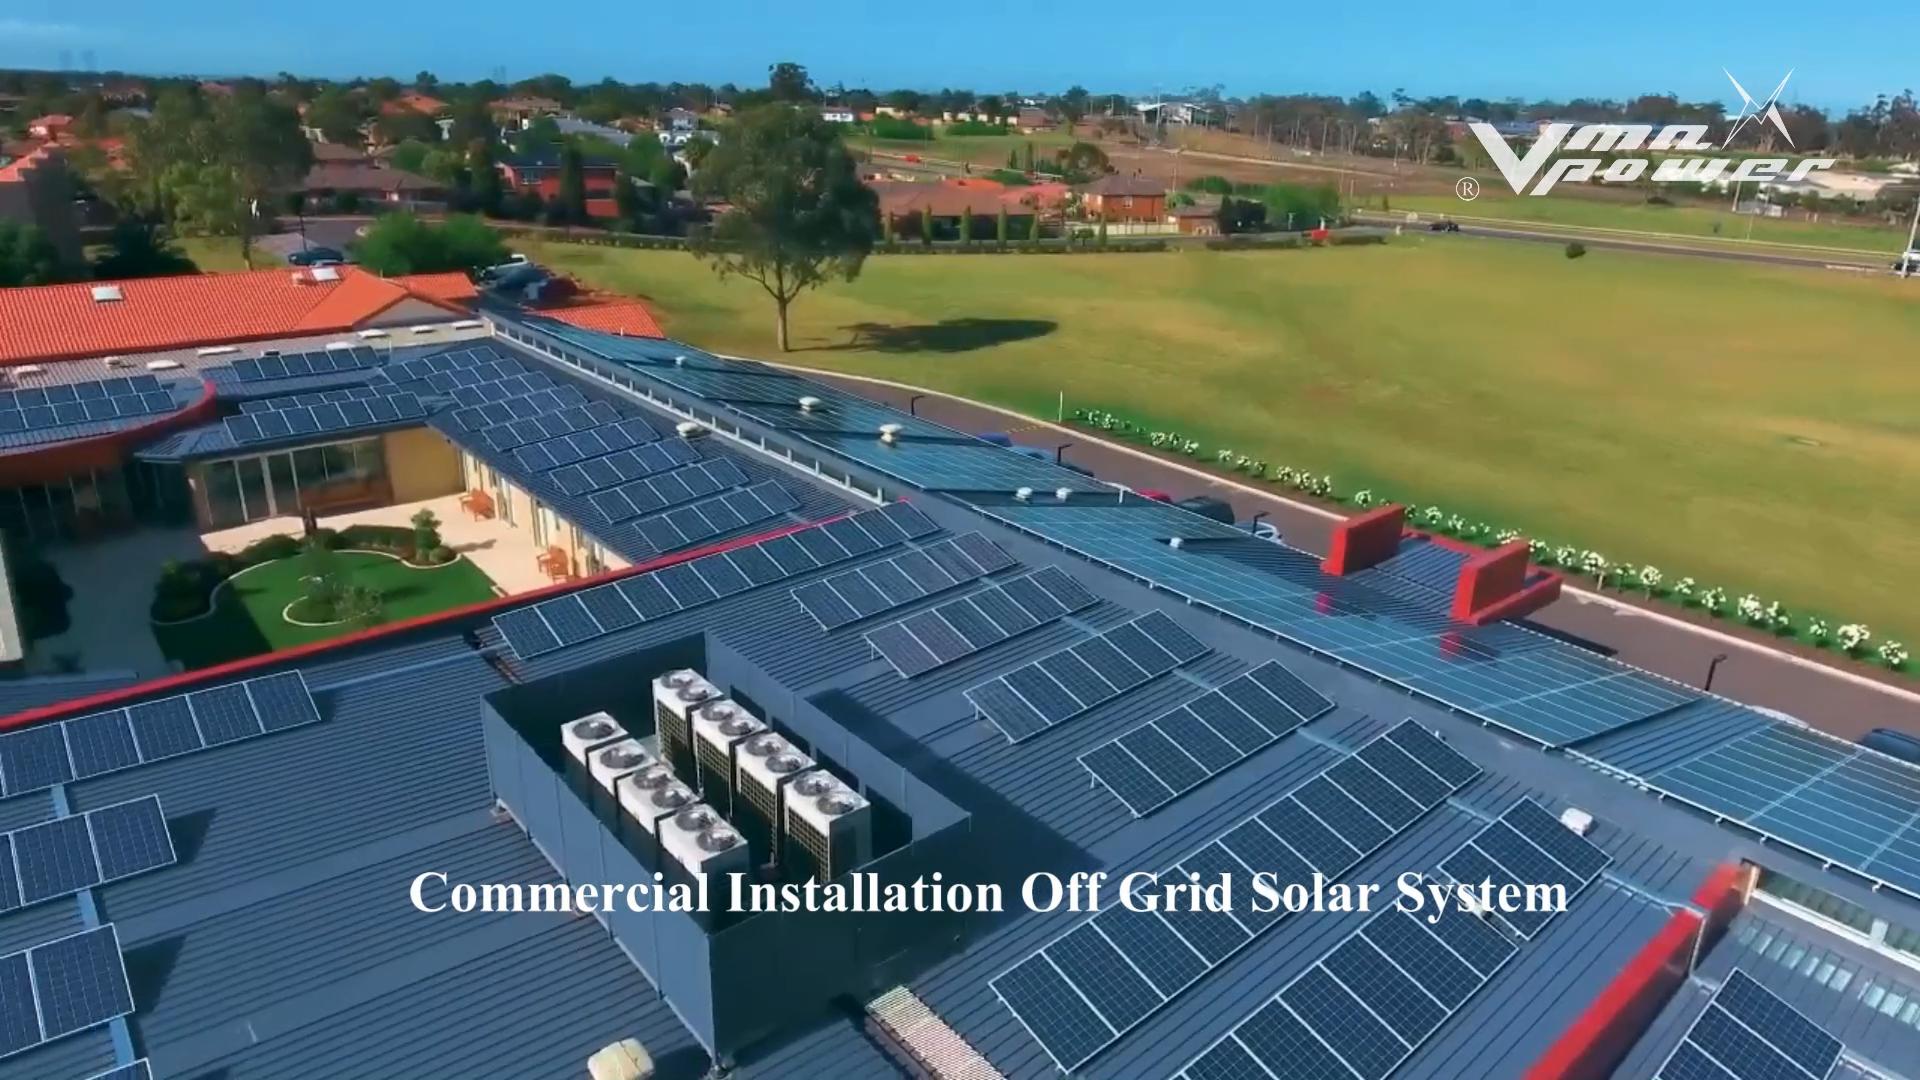 Vmaxpower 5kw Off Grid Híbrido Sistemas Domésticos de Energia Solar Em Casa Completa de Sistemas de Energia Solar Sistema de Energia Solar Para Casa